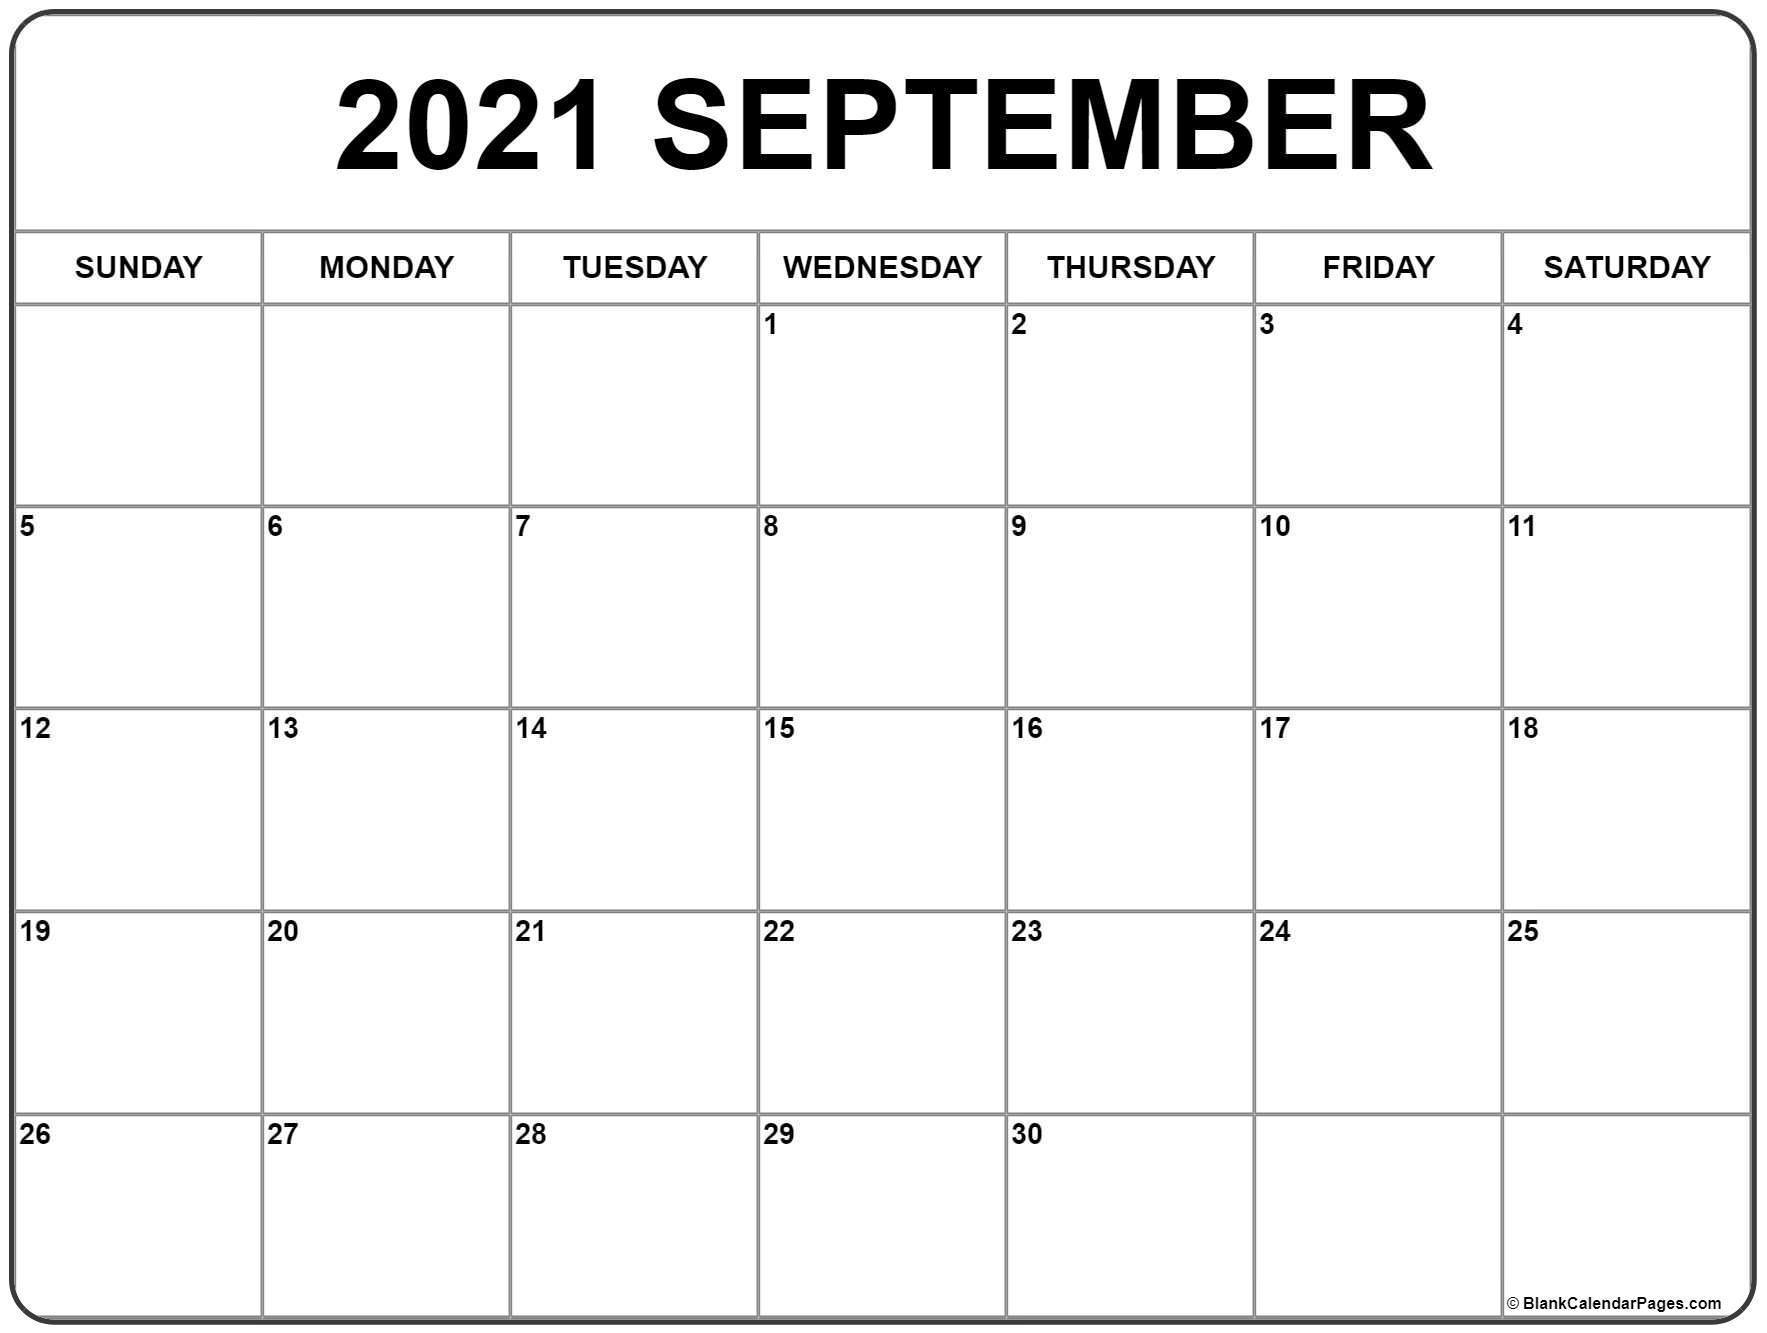 Collect Kalender 2021 August September